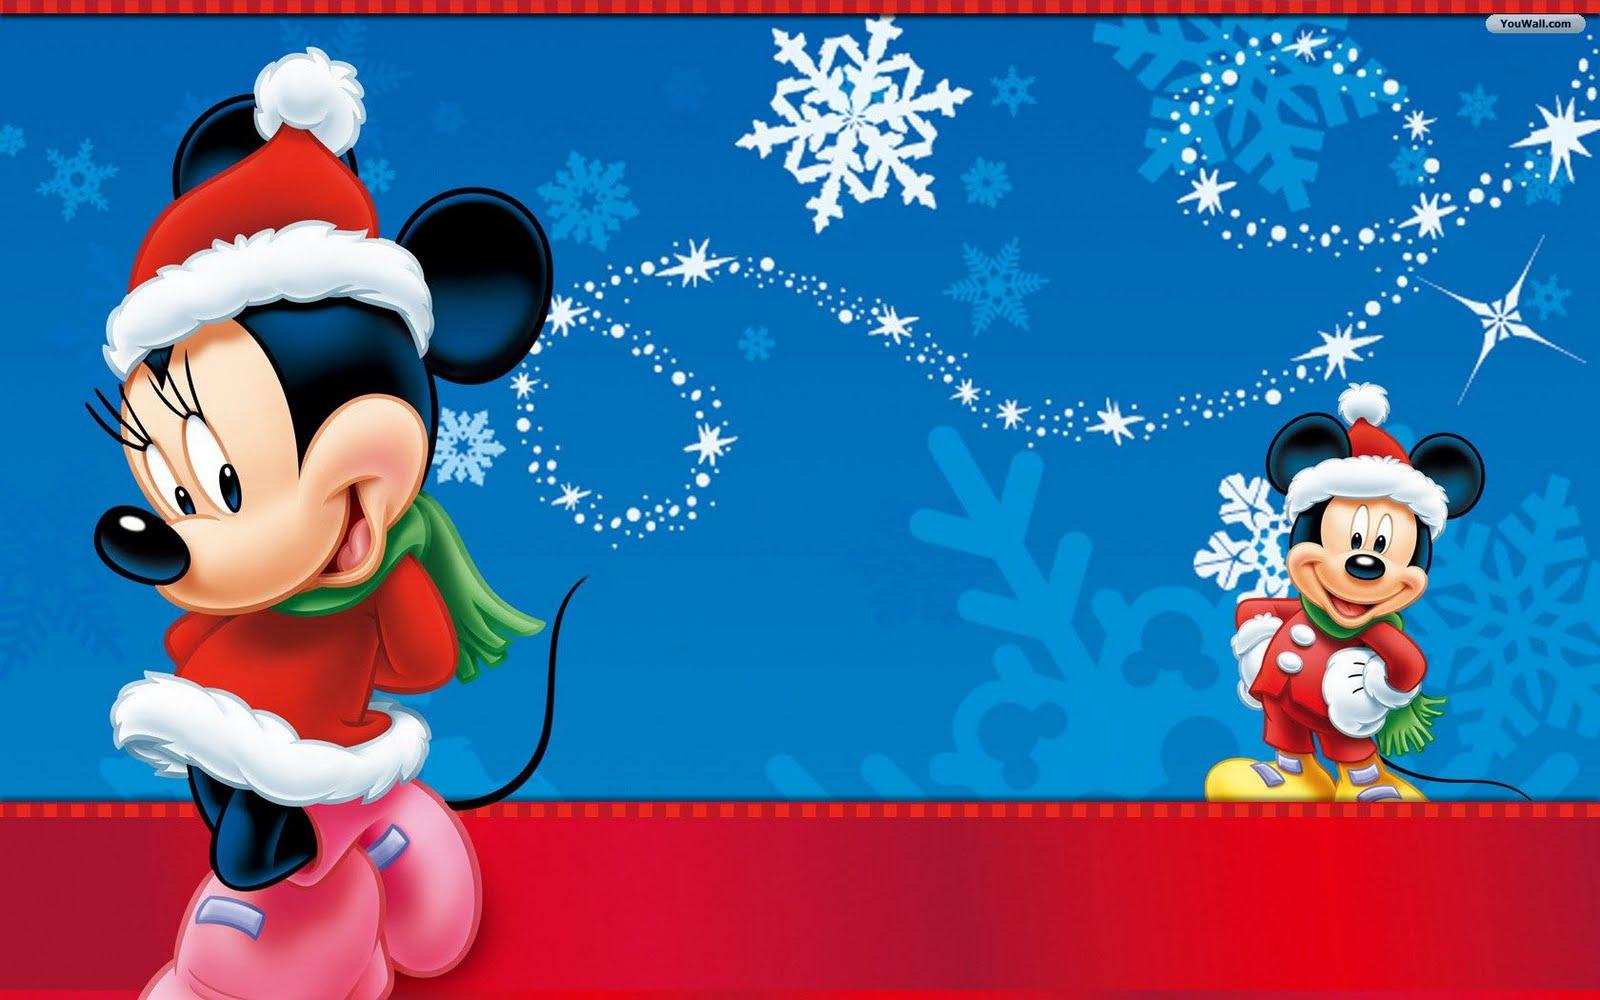 Disney Christmas Wallpapers Wallpaper Mansion 1600x1000